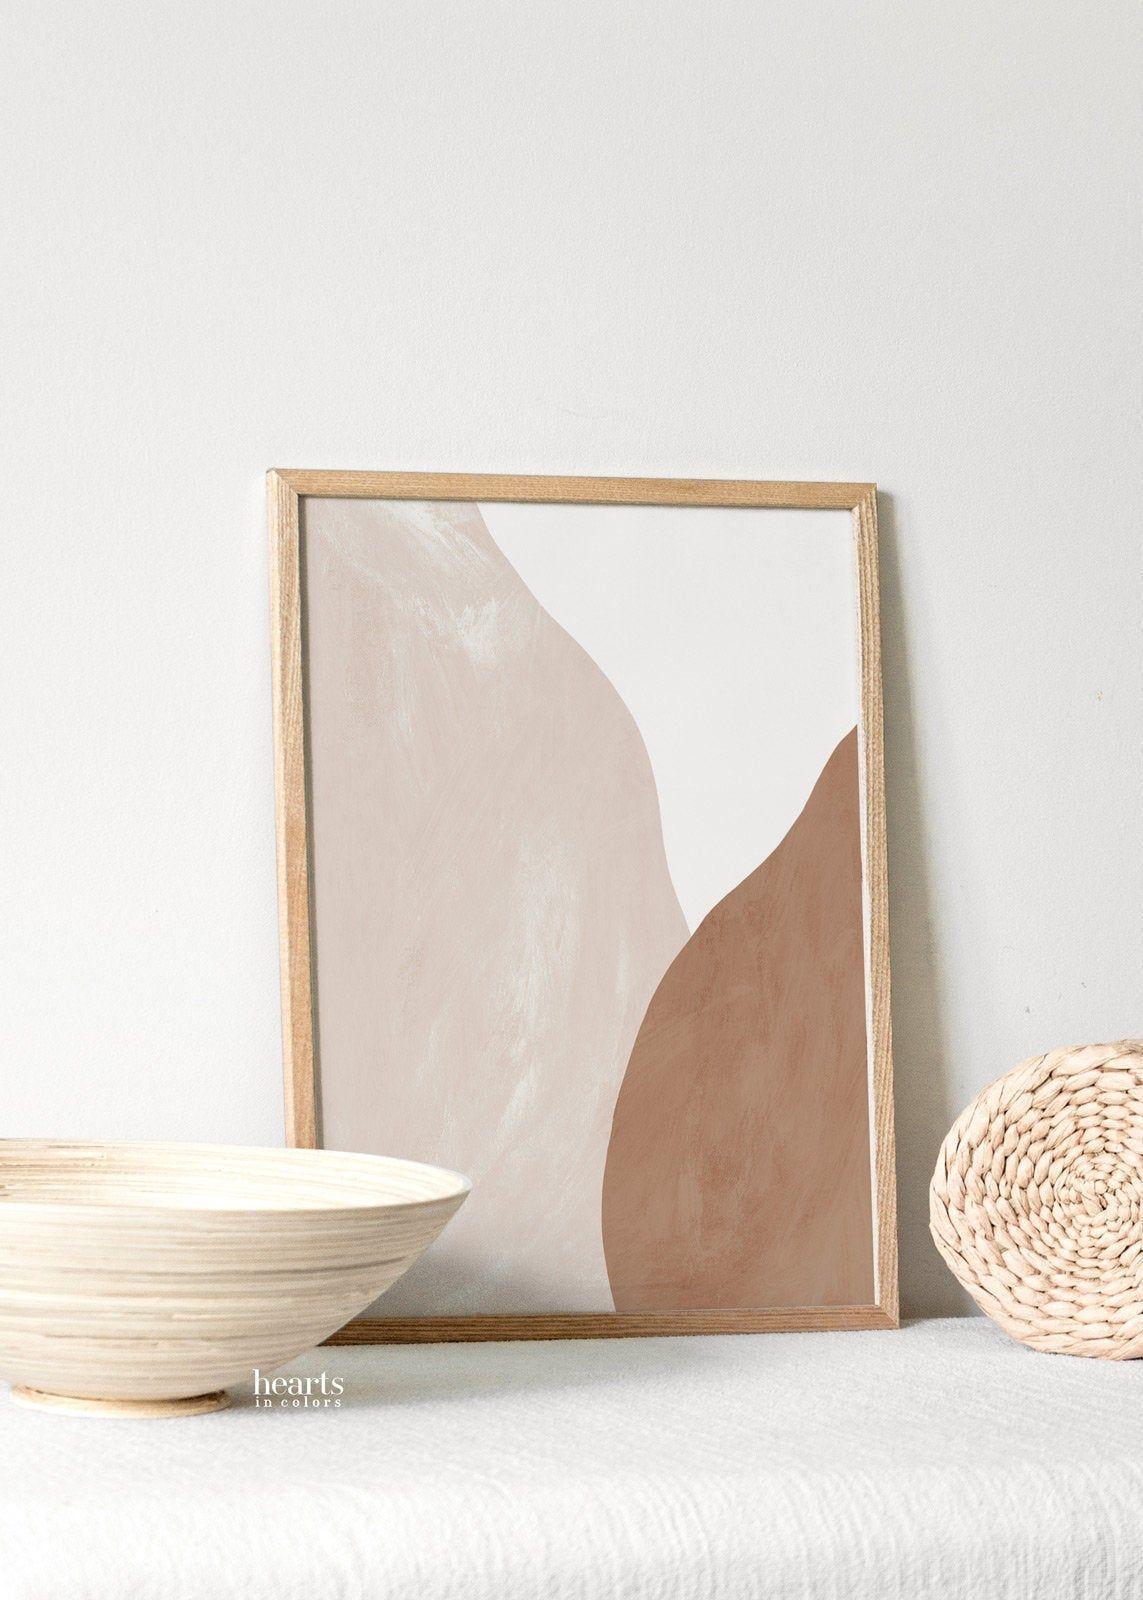 Abstract Print,Wall Print,Terracotta Print,Beige Print,Neutral Print,Print Wall Art,Modern Print,Modern Wall Decor,Abstract Art,Wall Hanging -   - #Abstract #ArtModern #ArtWall #DecorAbstract #Hanging #PrintBeige #PrintModern #PrintNeutral #PrintPrint #PrintTerracotta #PrintWall #Wall #wallartdiy